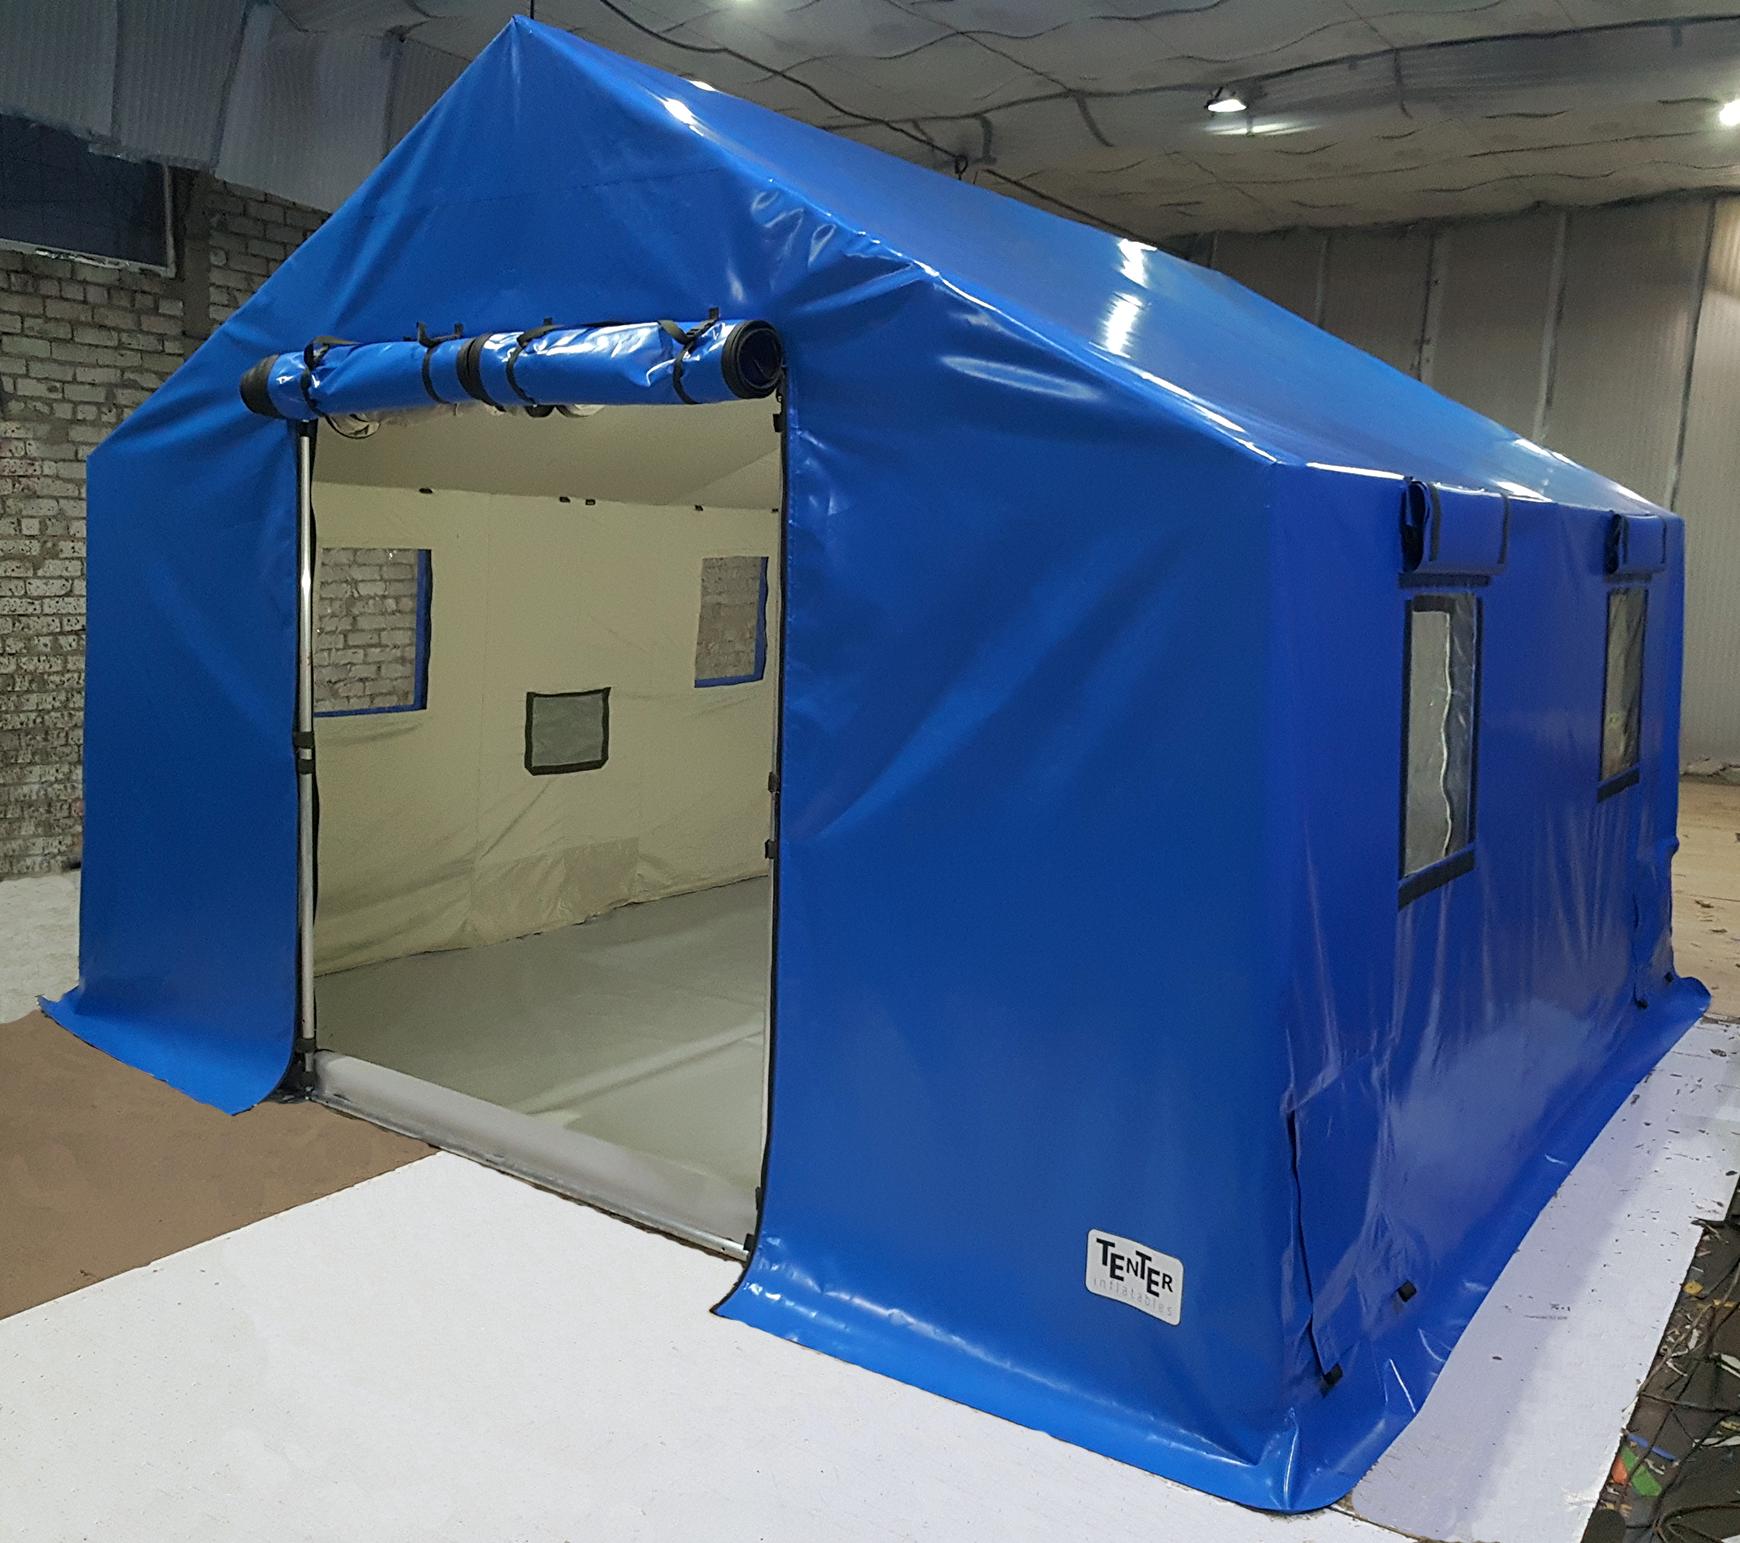 Универсальная военная спасательная каркасная палатка TENTER AFT-40-40